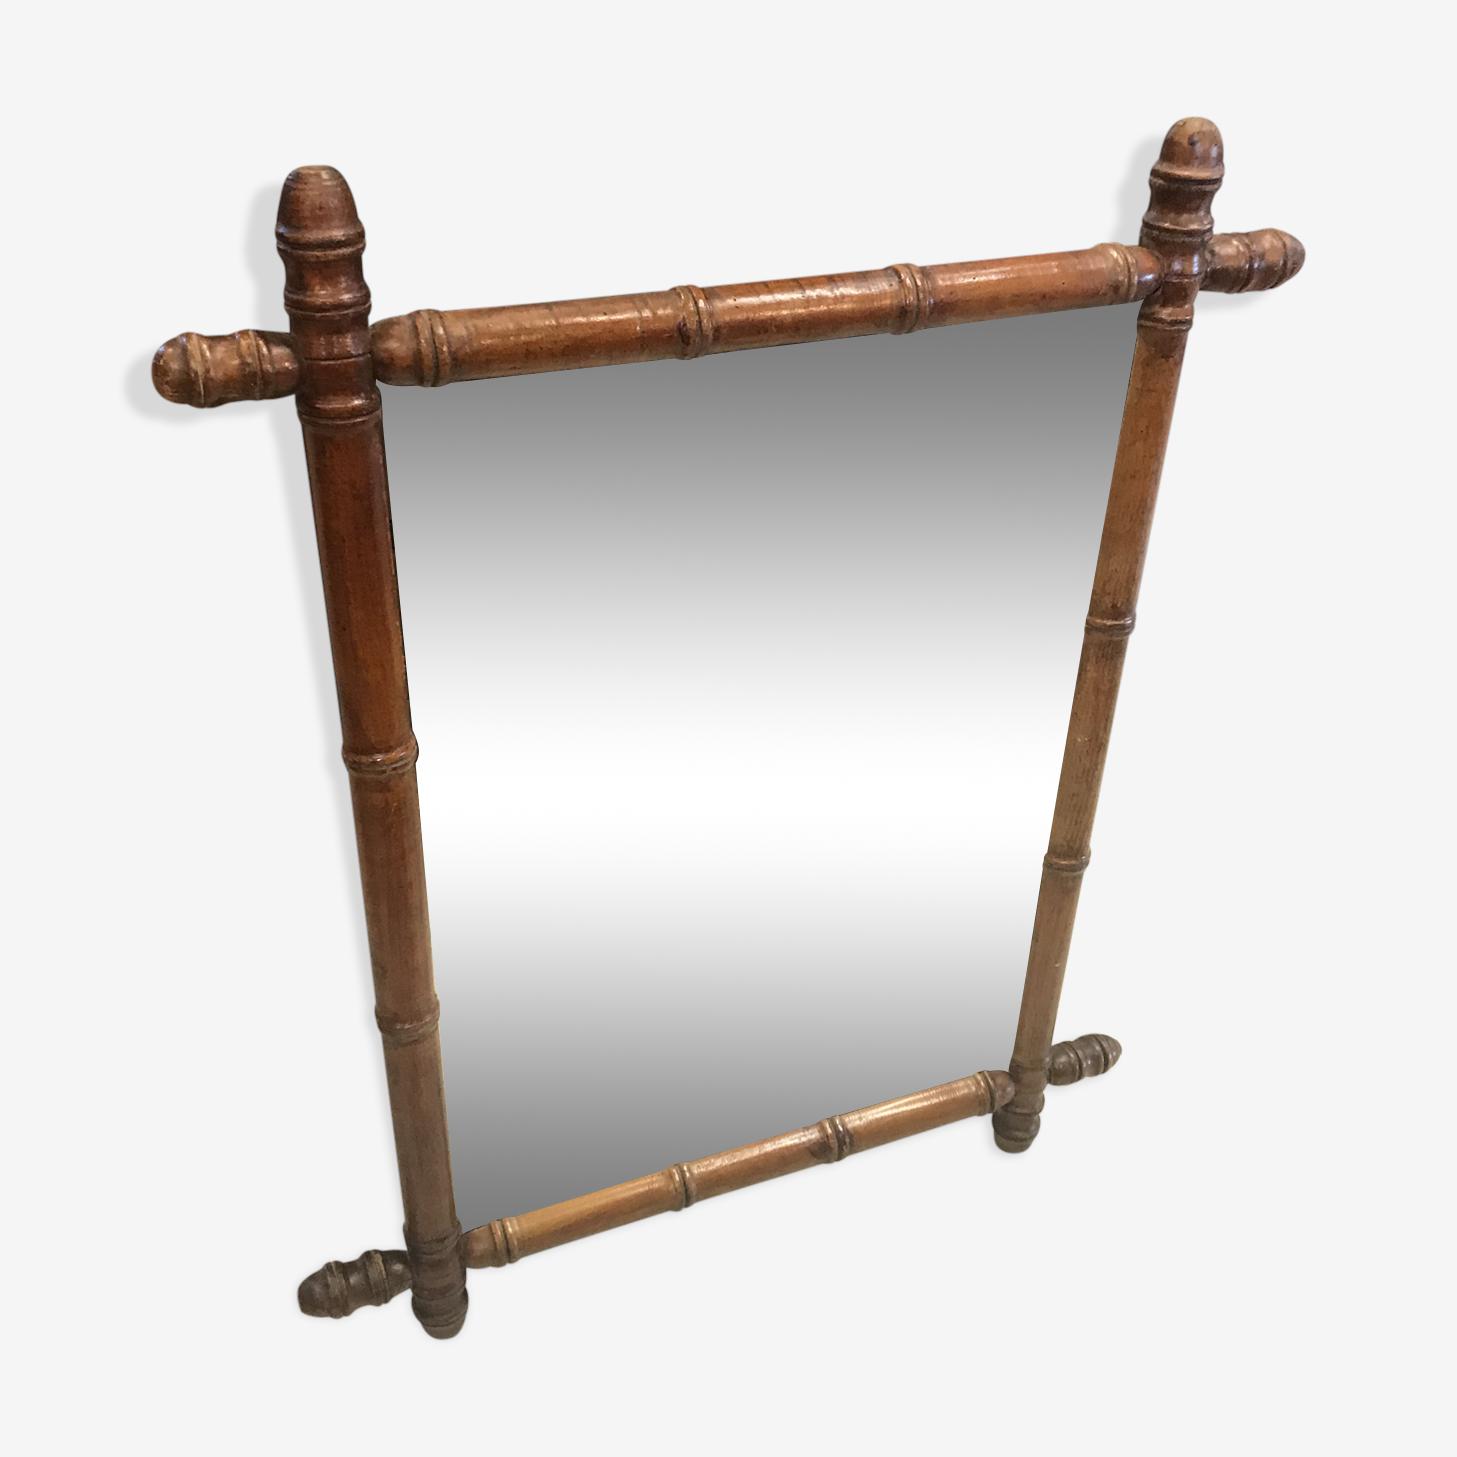 Mirror bamboo 77 x 62cm